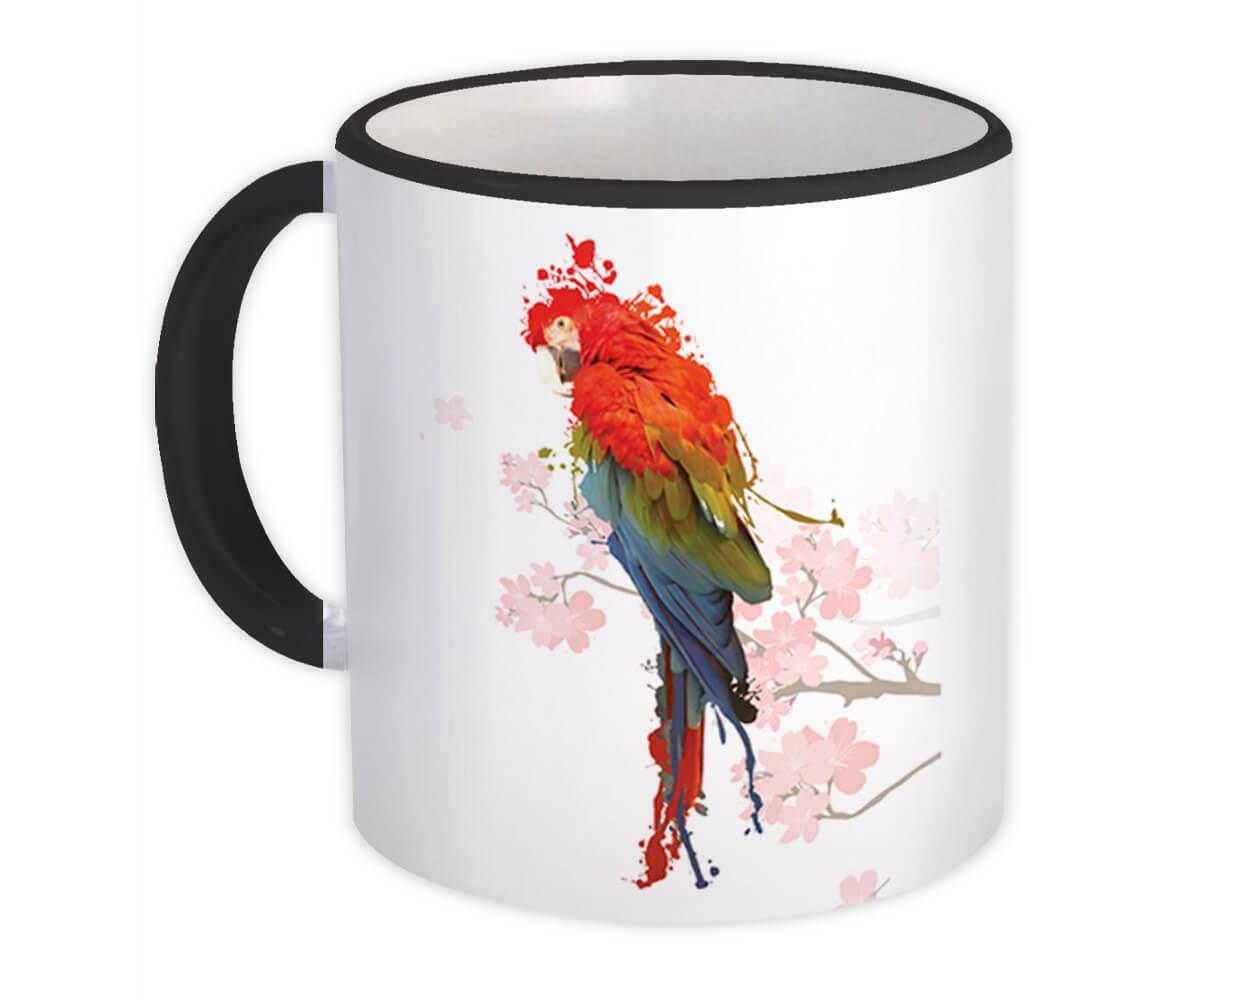 Macaw : Gift Mug Artistic Parrot Bird Modern Contemporary